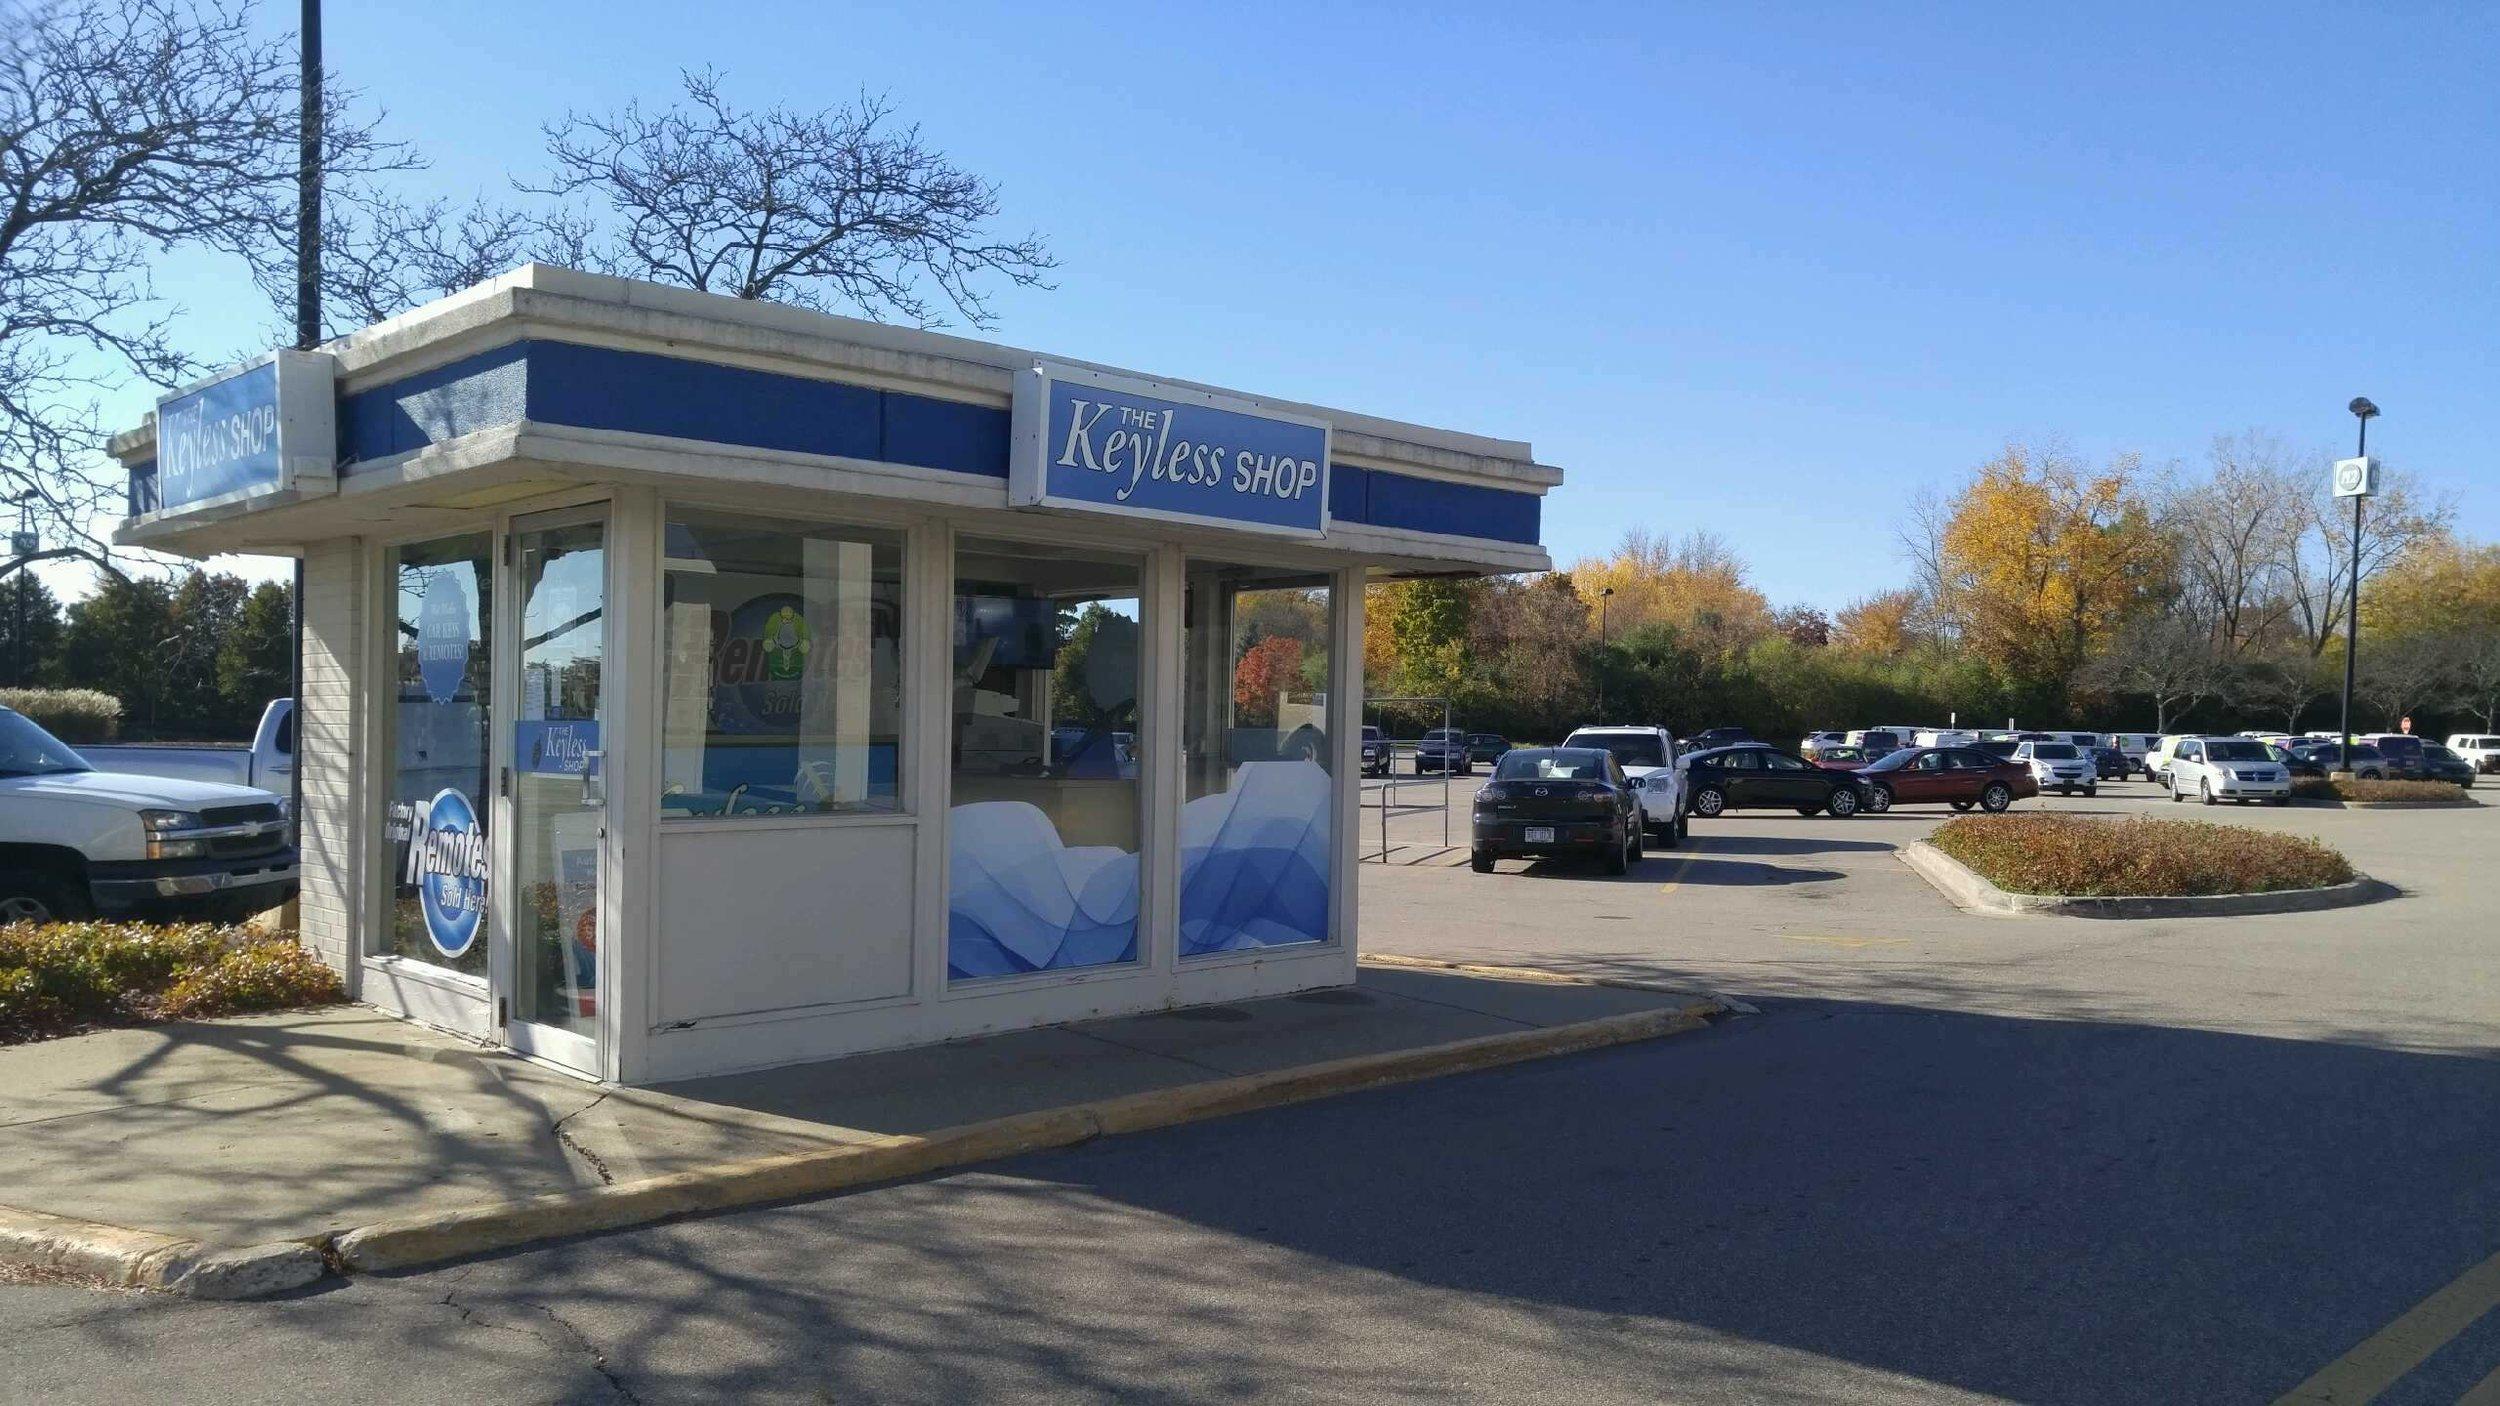 The Keyless Shop at Sears in Grand Rapids, MI    https://www.facebook.com/keylessshopgr/